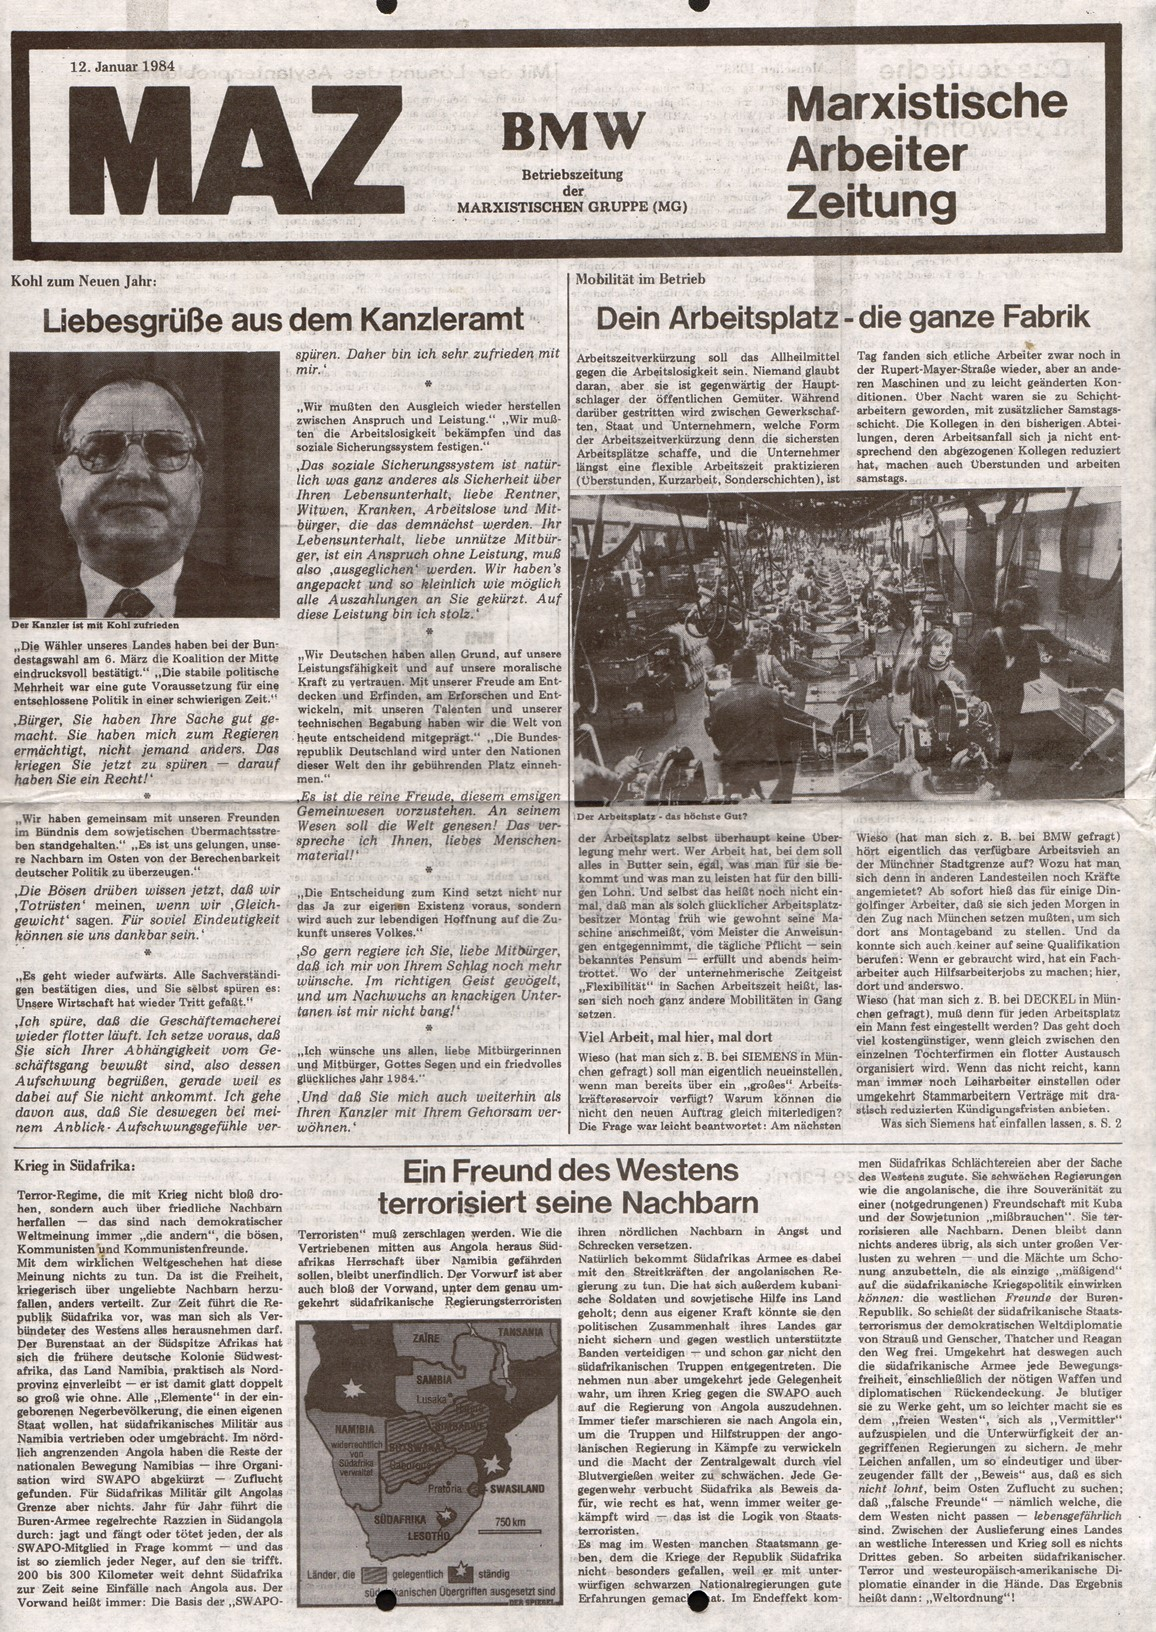 Muenchen_MG_MAZ_BMW_19840112_01